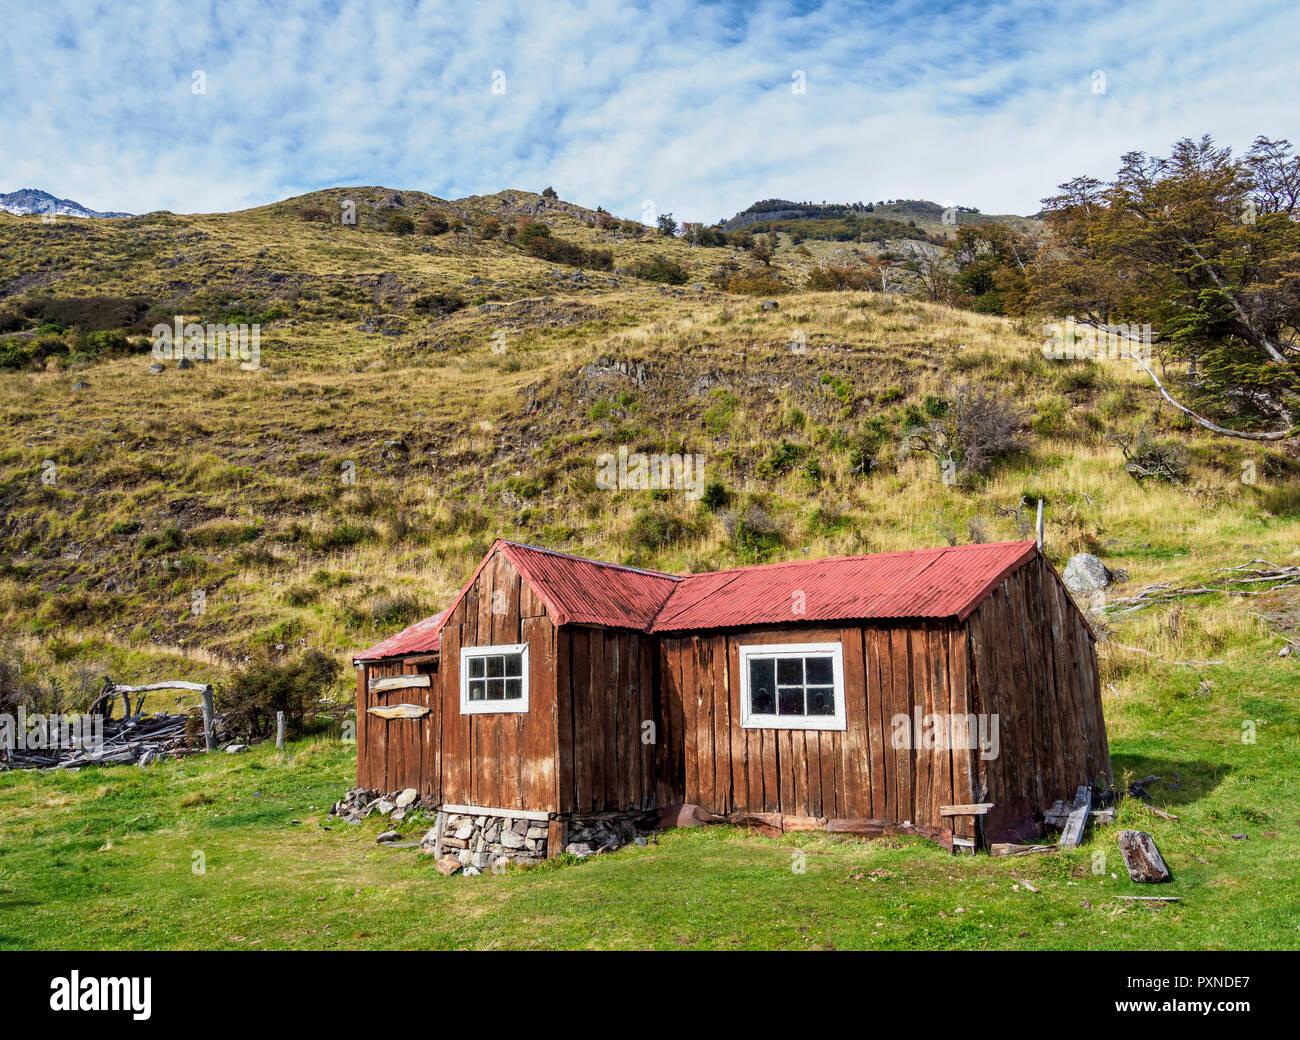 Finnish Hut, Los Glaciares National Park, Santa Cruz Province, Patagonia, Argentina - Stock Image